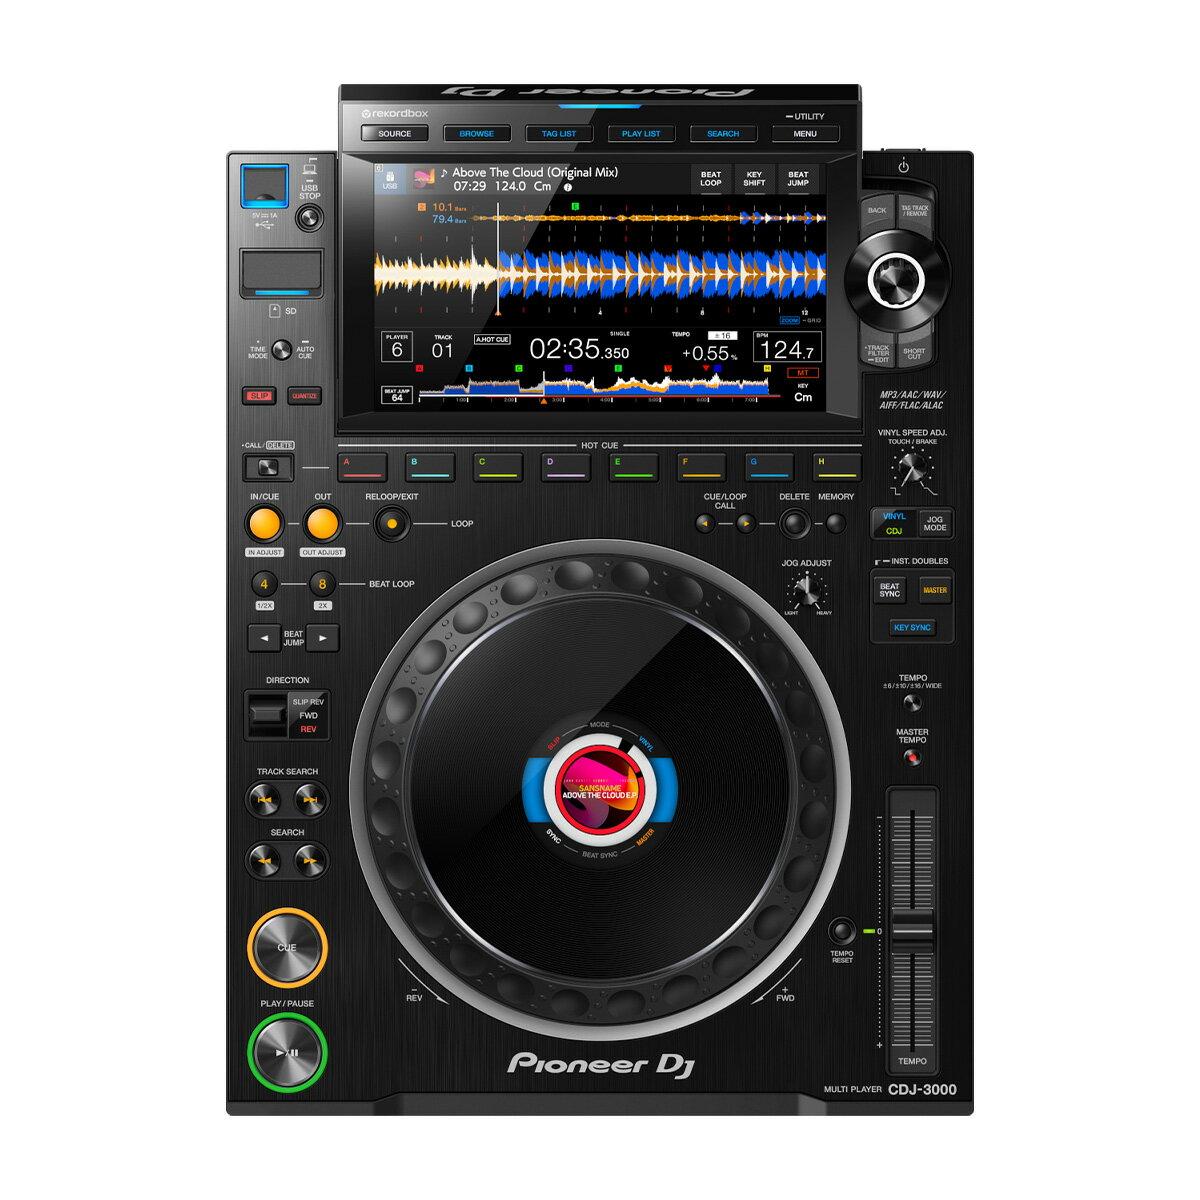 DJ機器, CDJプレーヤー Pioneer DJ CDJ-3000 DJ